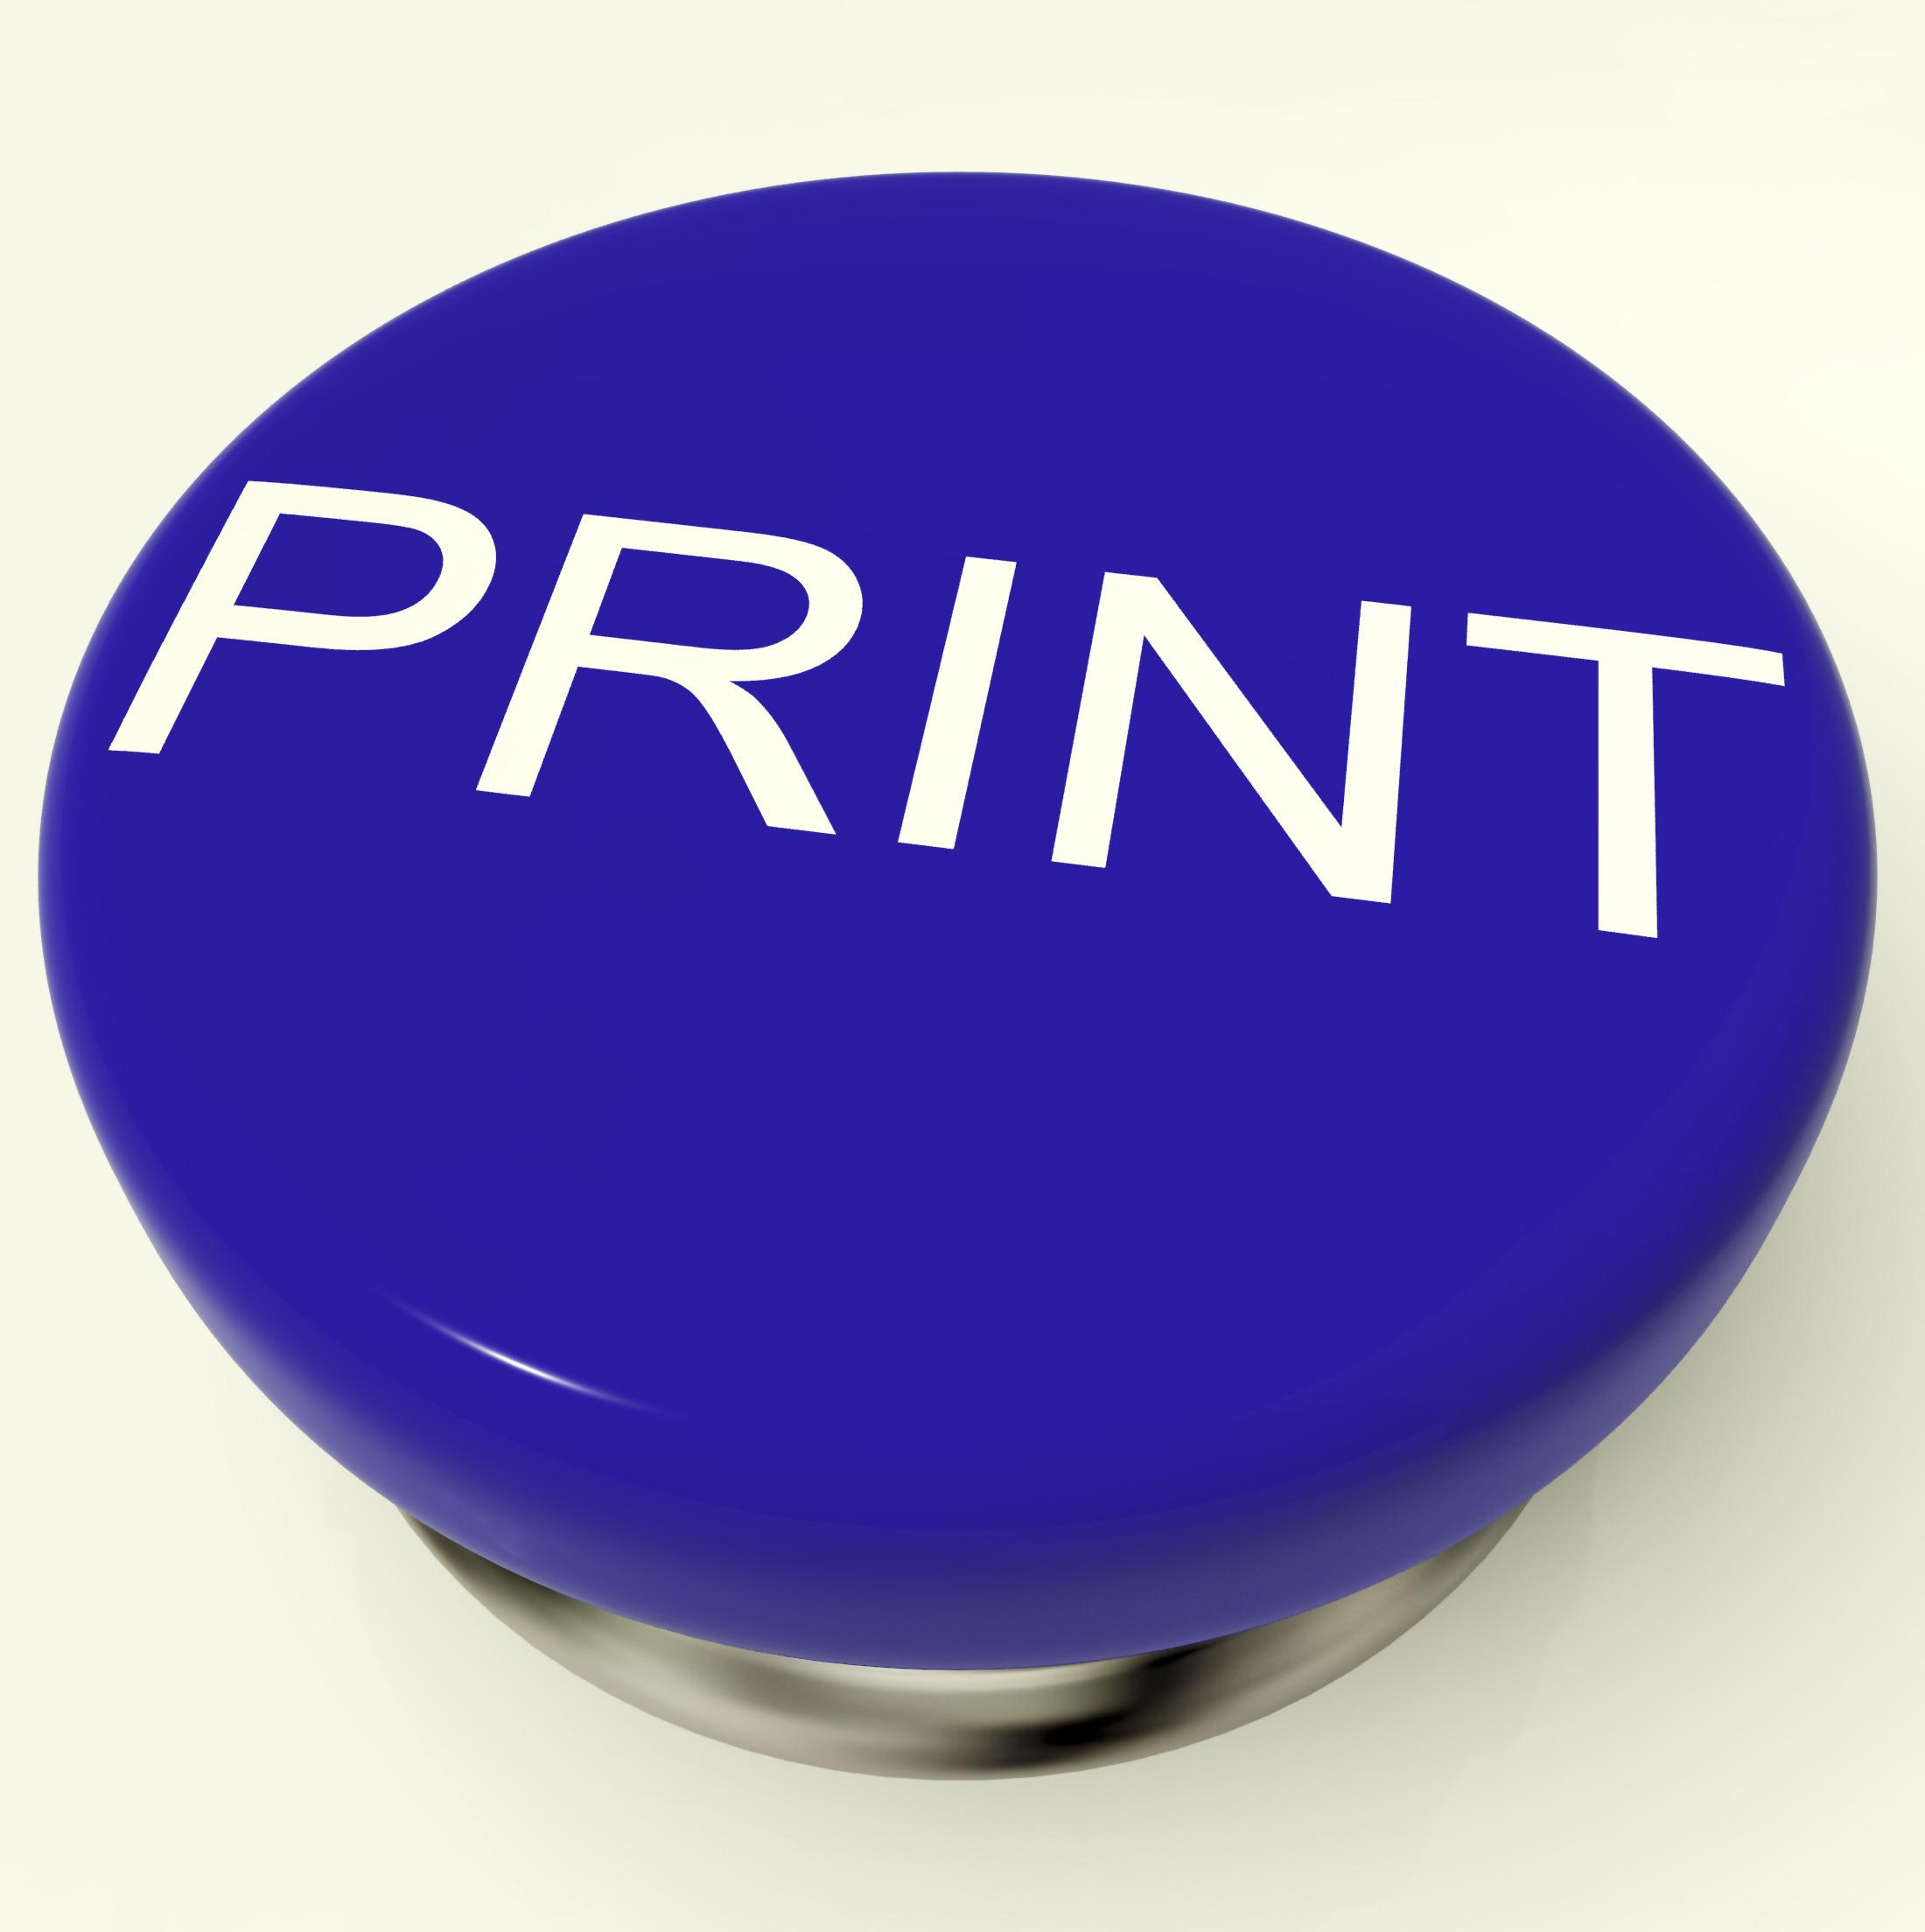 print button as symbol for printing or printer z1vXzrPu